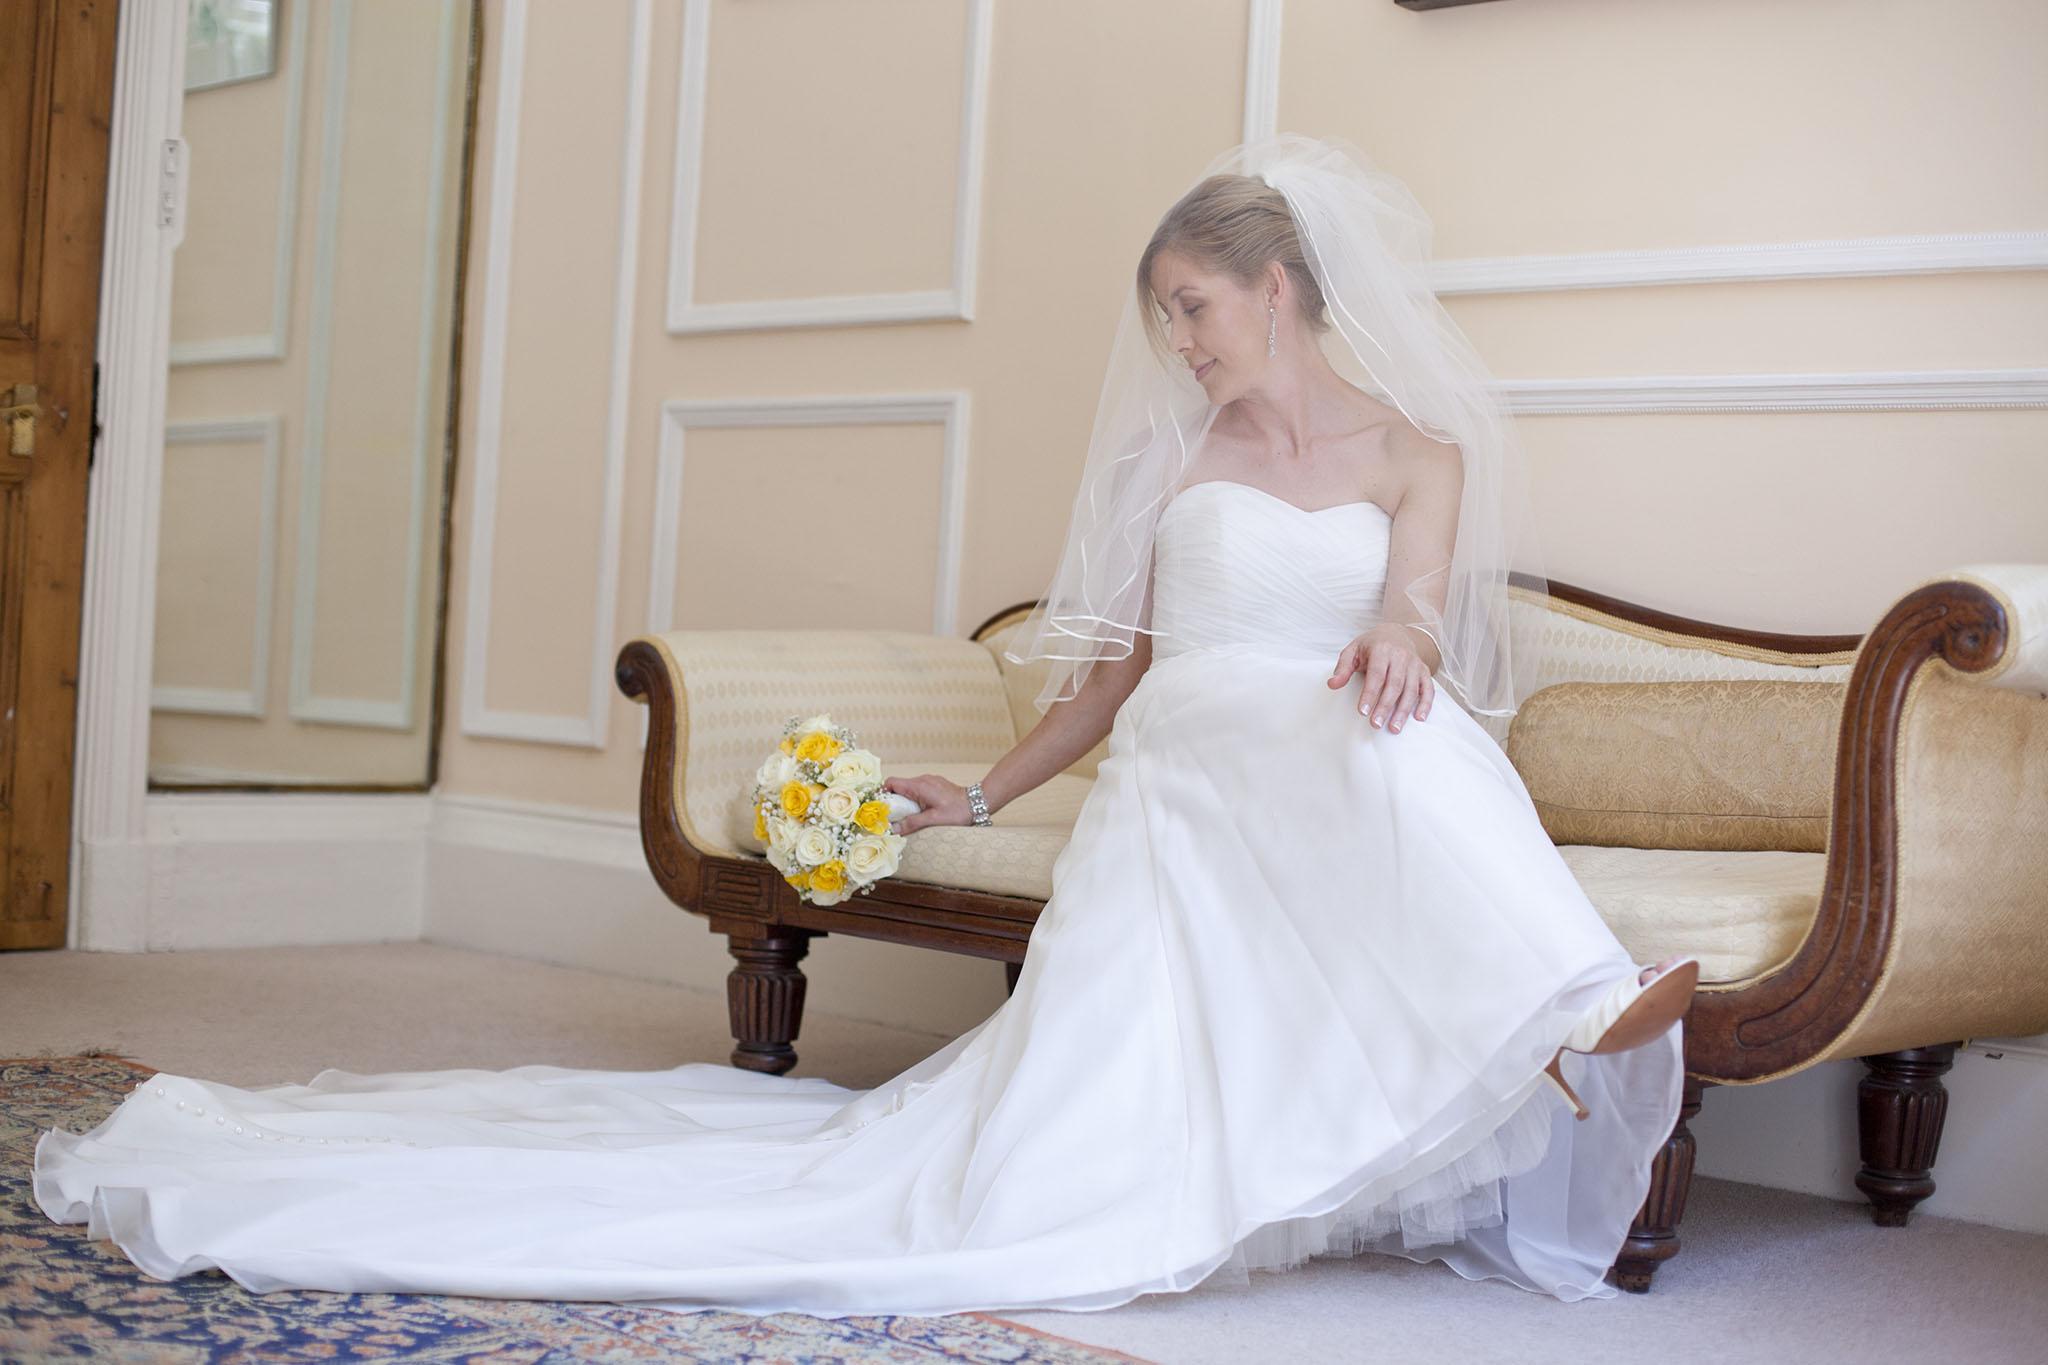 elizabethg_fineart_photography_hertfordshire_rachel_adam_wedding_highelmsmanor_15.jpg